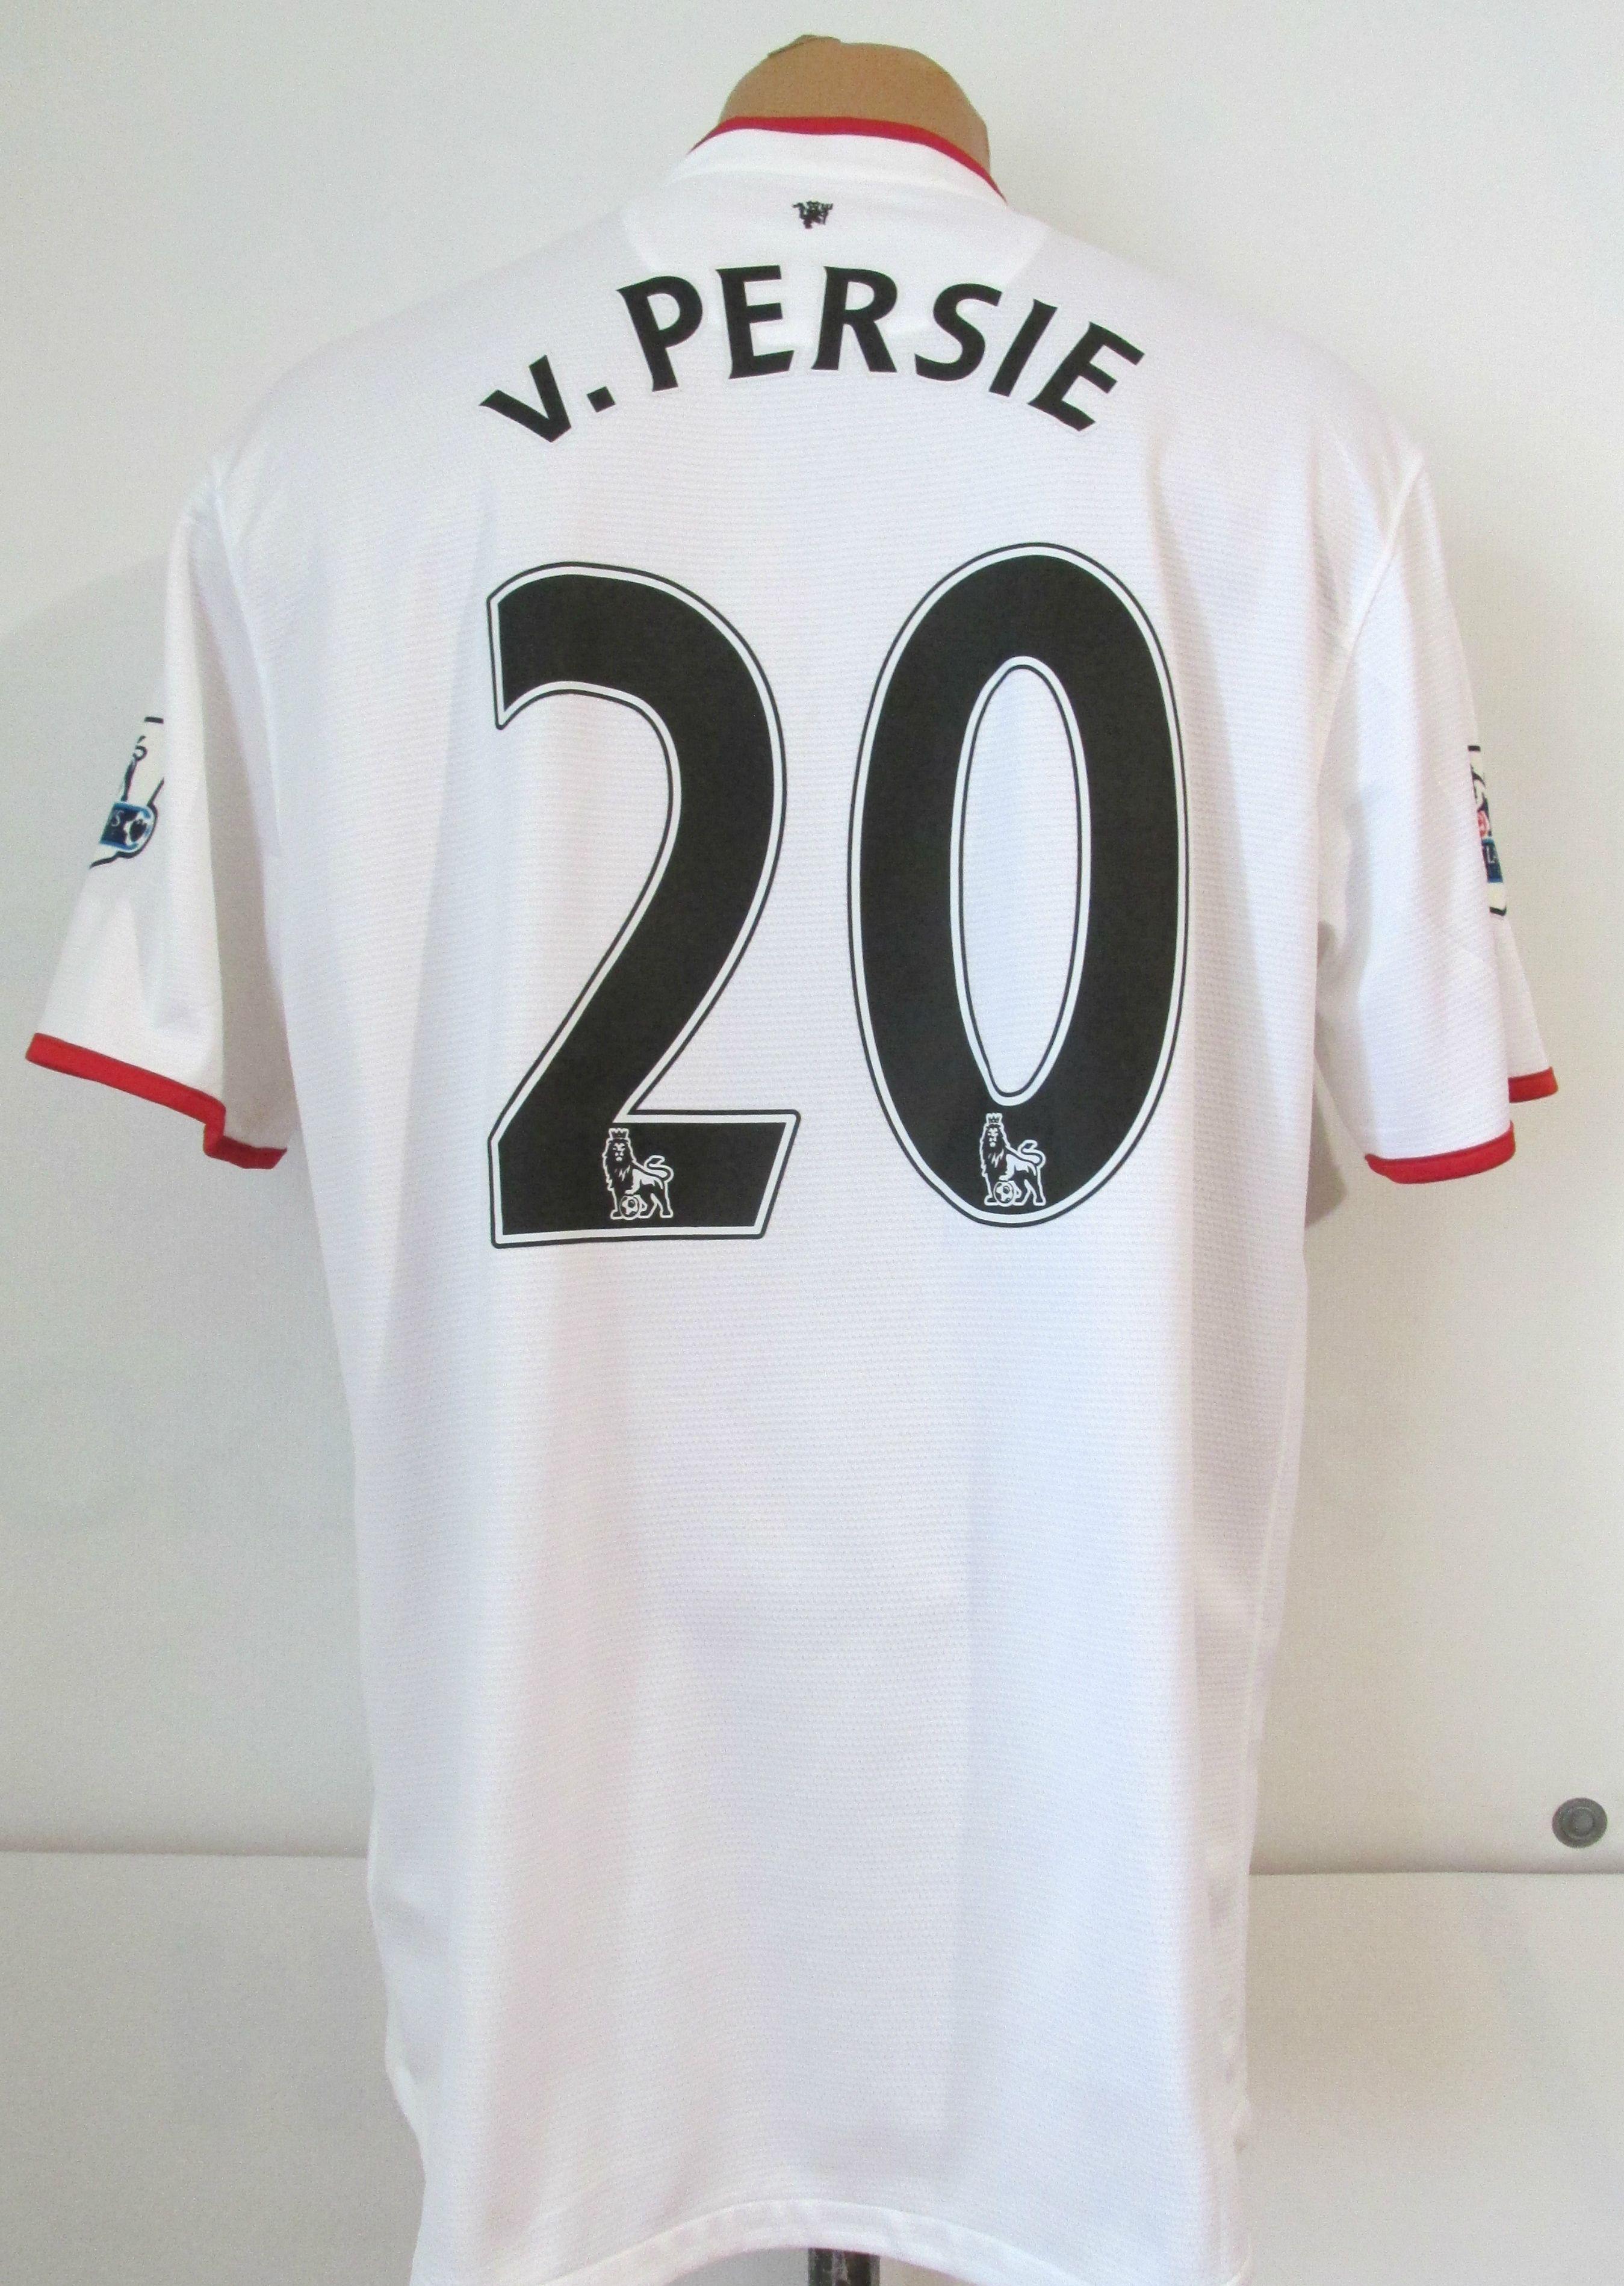 817d549f6 Manchester United 2012 2013 2014 away football shirt Robin van Persie  20  by Nike MUFC ManUnited RedDevils PremierLeague England soccer jersey white  ...